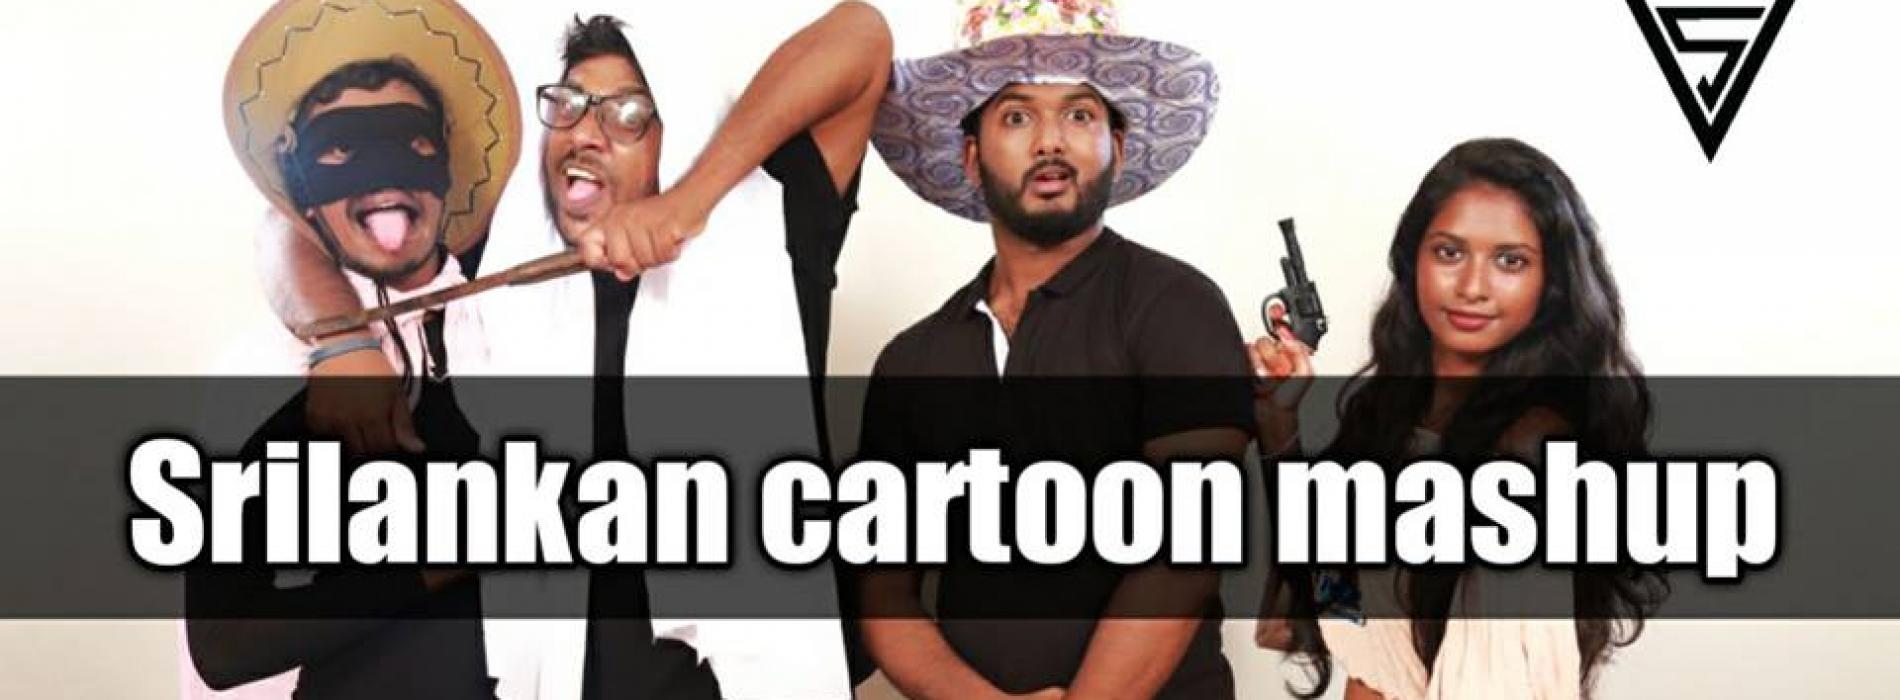 Sri Lankan Cartoon Mashup | පොඩි කාලෙ ඉඳන් අහපු කාටූන් සිංදු | VIIRUS